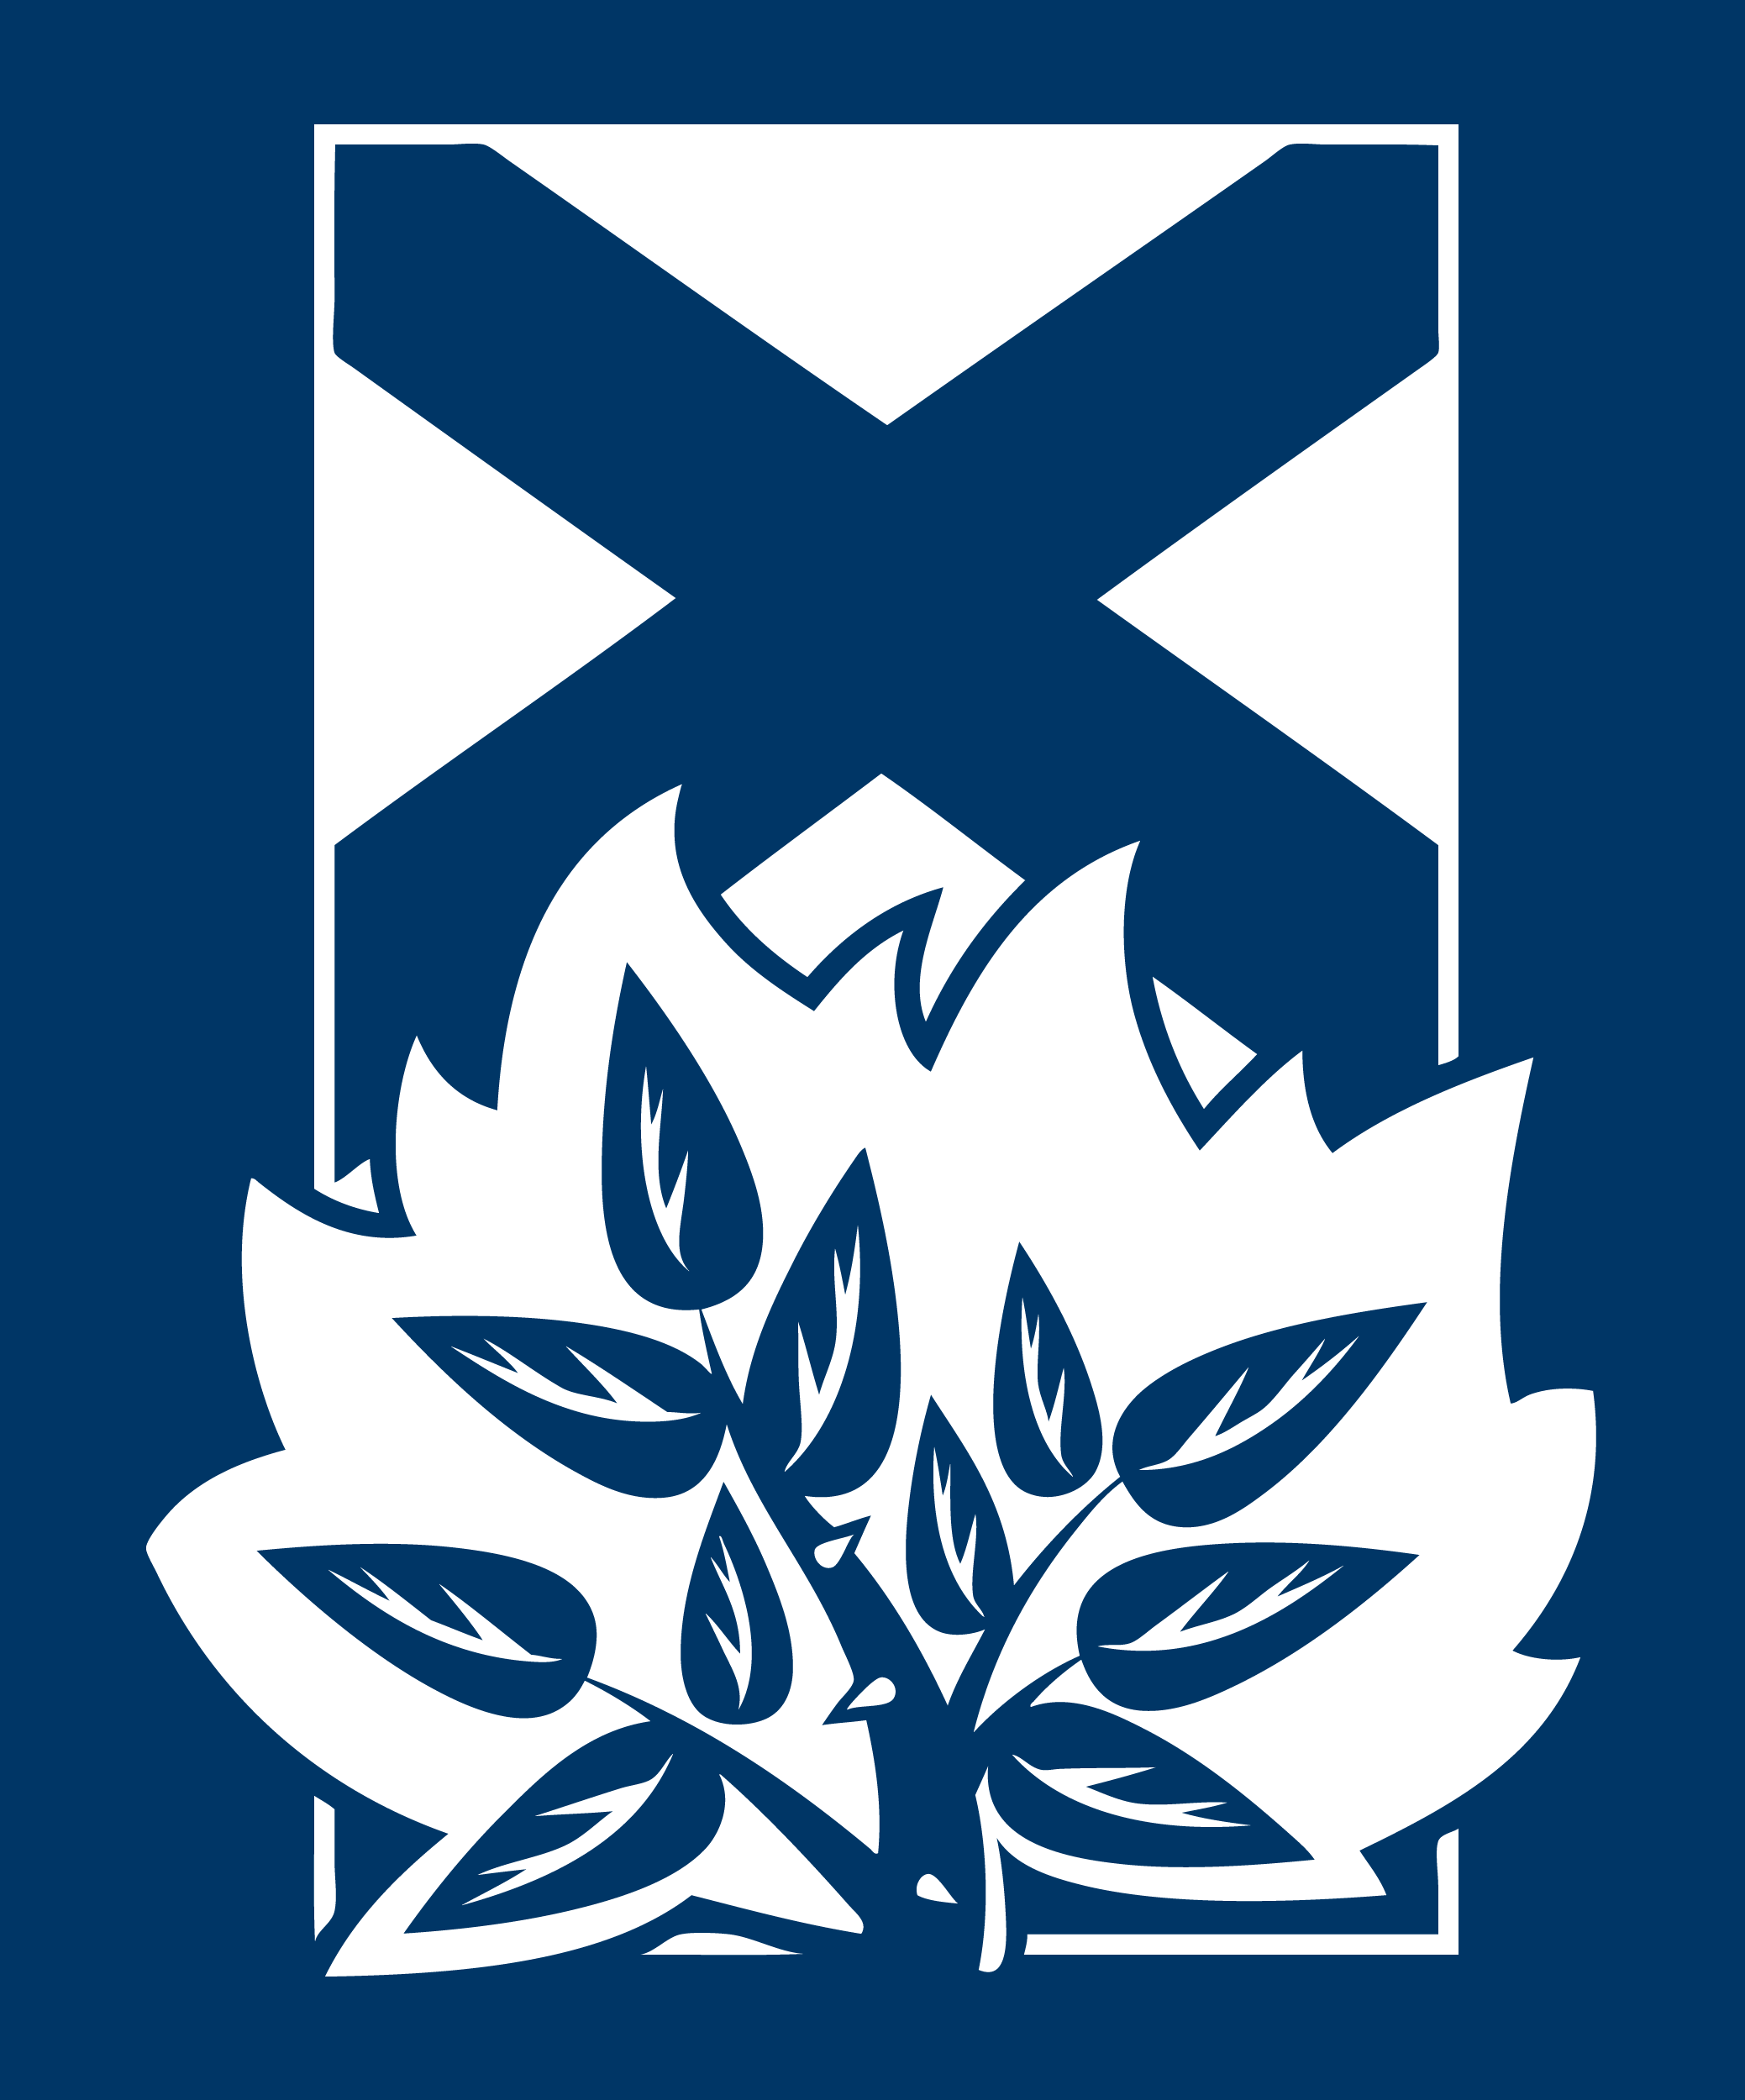 church_of_scotland.png